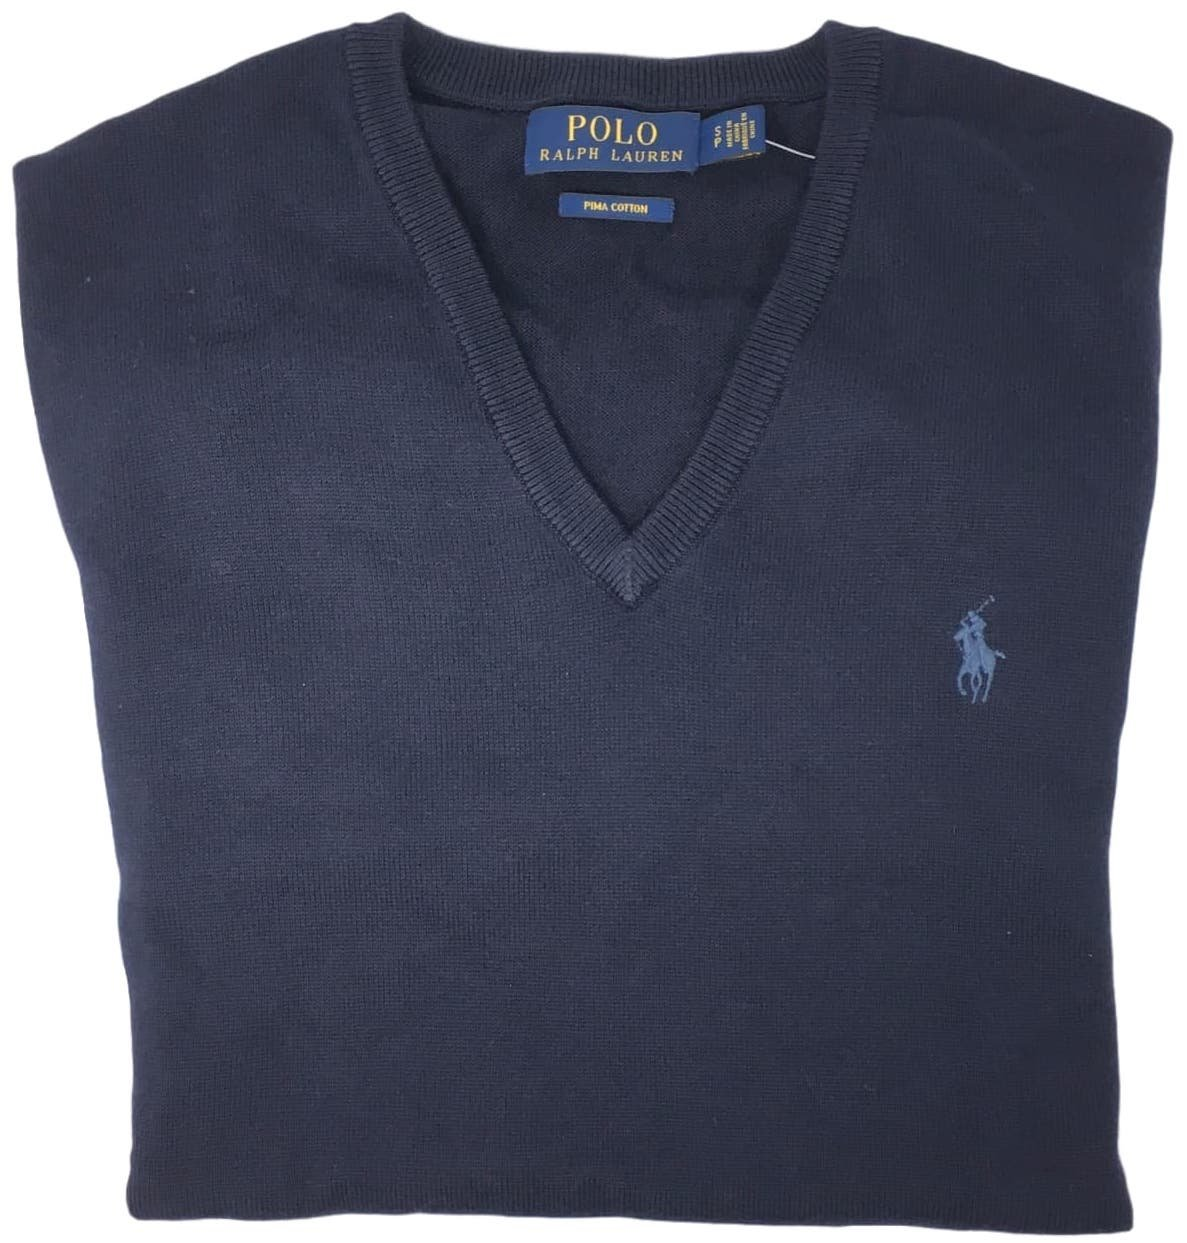 Polo Ralph Lauren Mens Pima Cotton V-Neck Sweater (Navybluepny , S) by Ralph Lauren